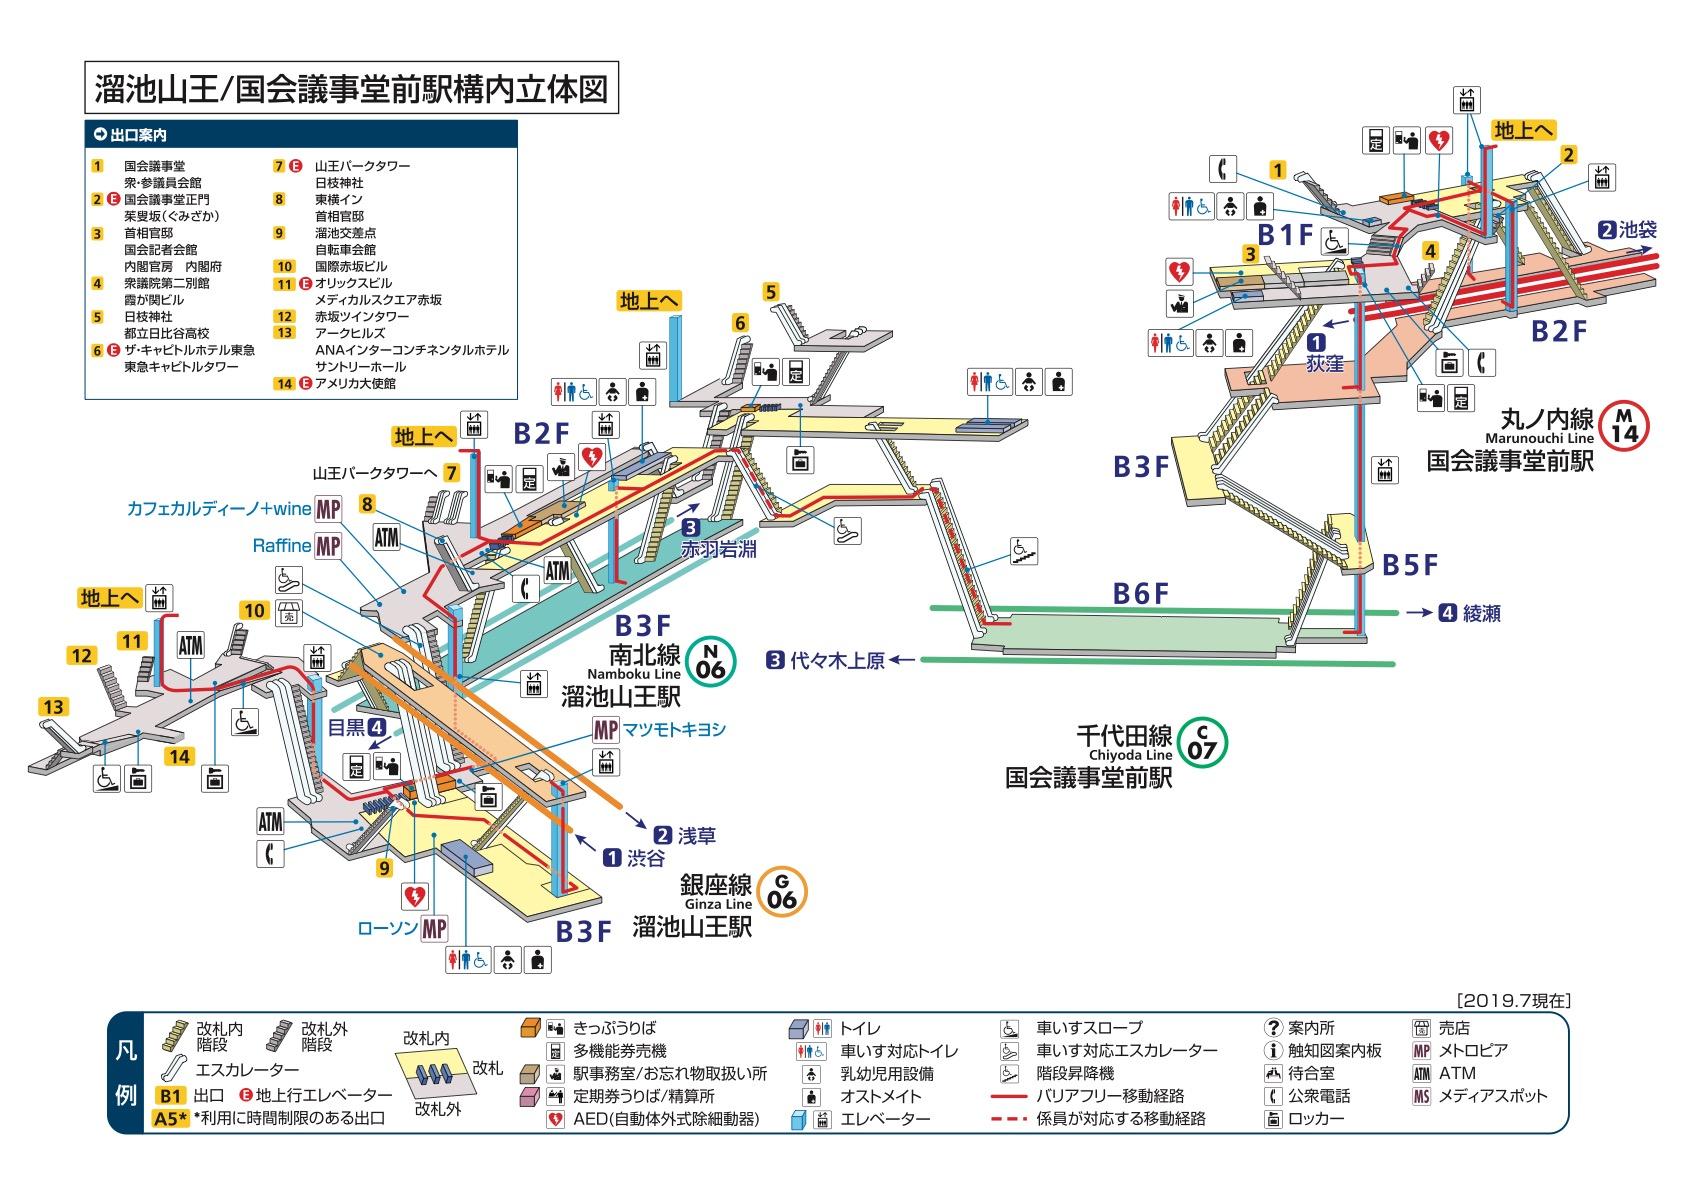 https://www.tokyometro.jp/station/yardmap_img/_station_%E6%BA%9C%E6%B1%A0%E5%B1%B1%E7%8E%8B_%E5%9B%BD%E4%BC%9A%E8%AD%B0%E4%BA%8B%E5%A0%82_yardmap_images_yardmap.jpg